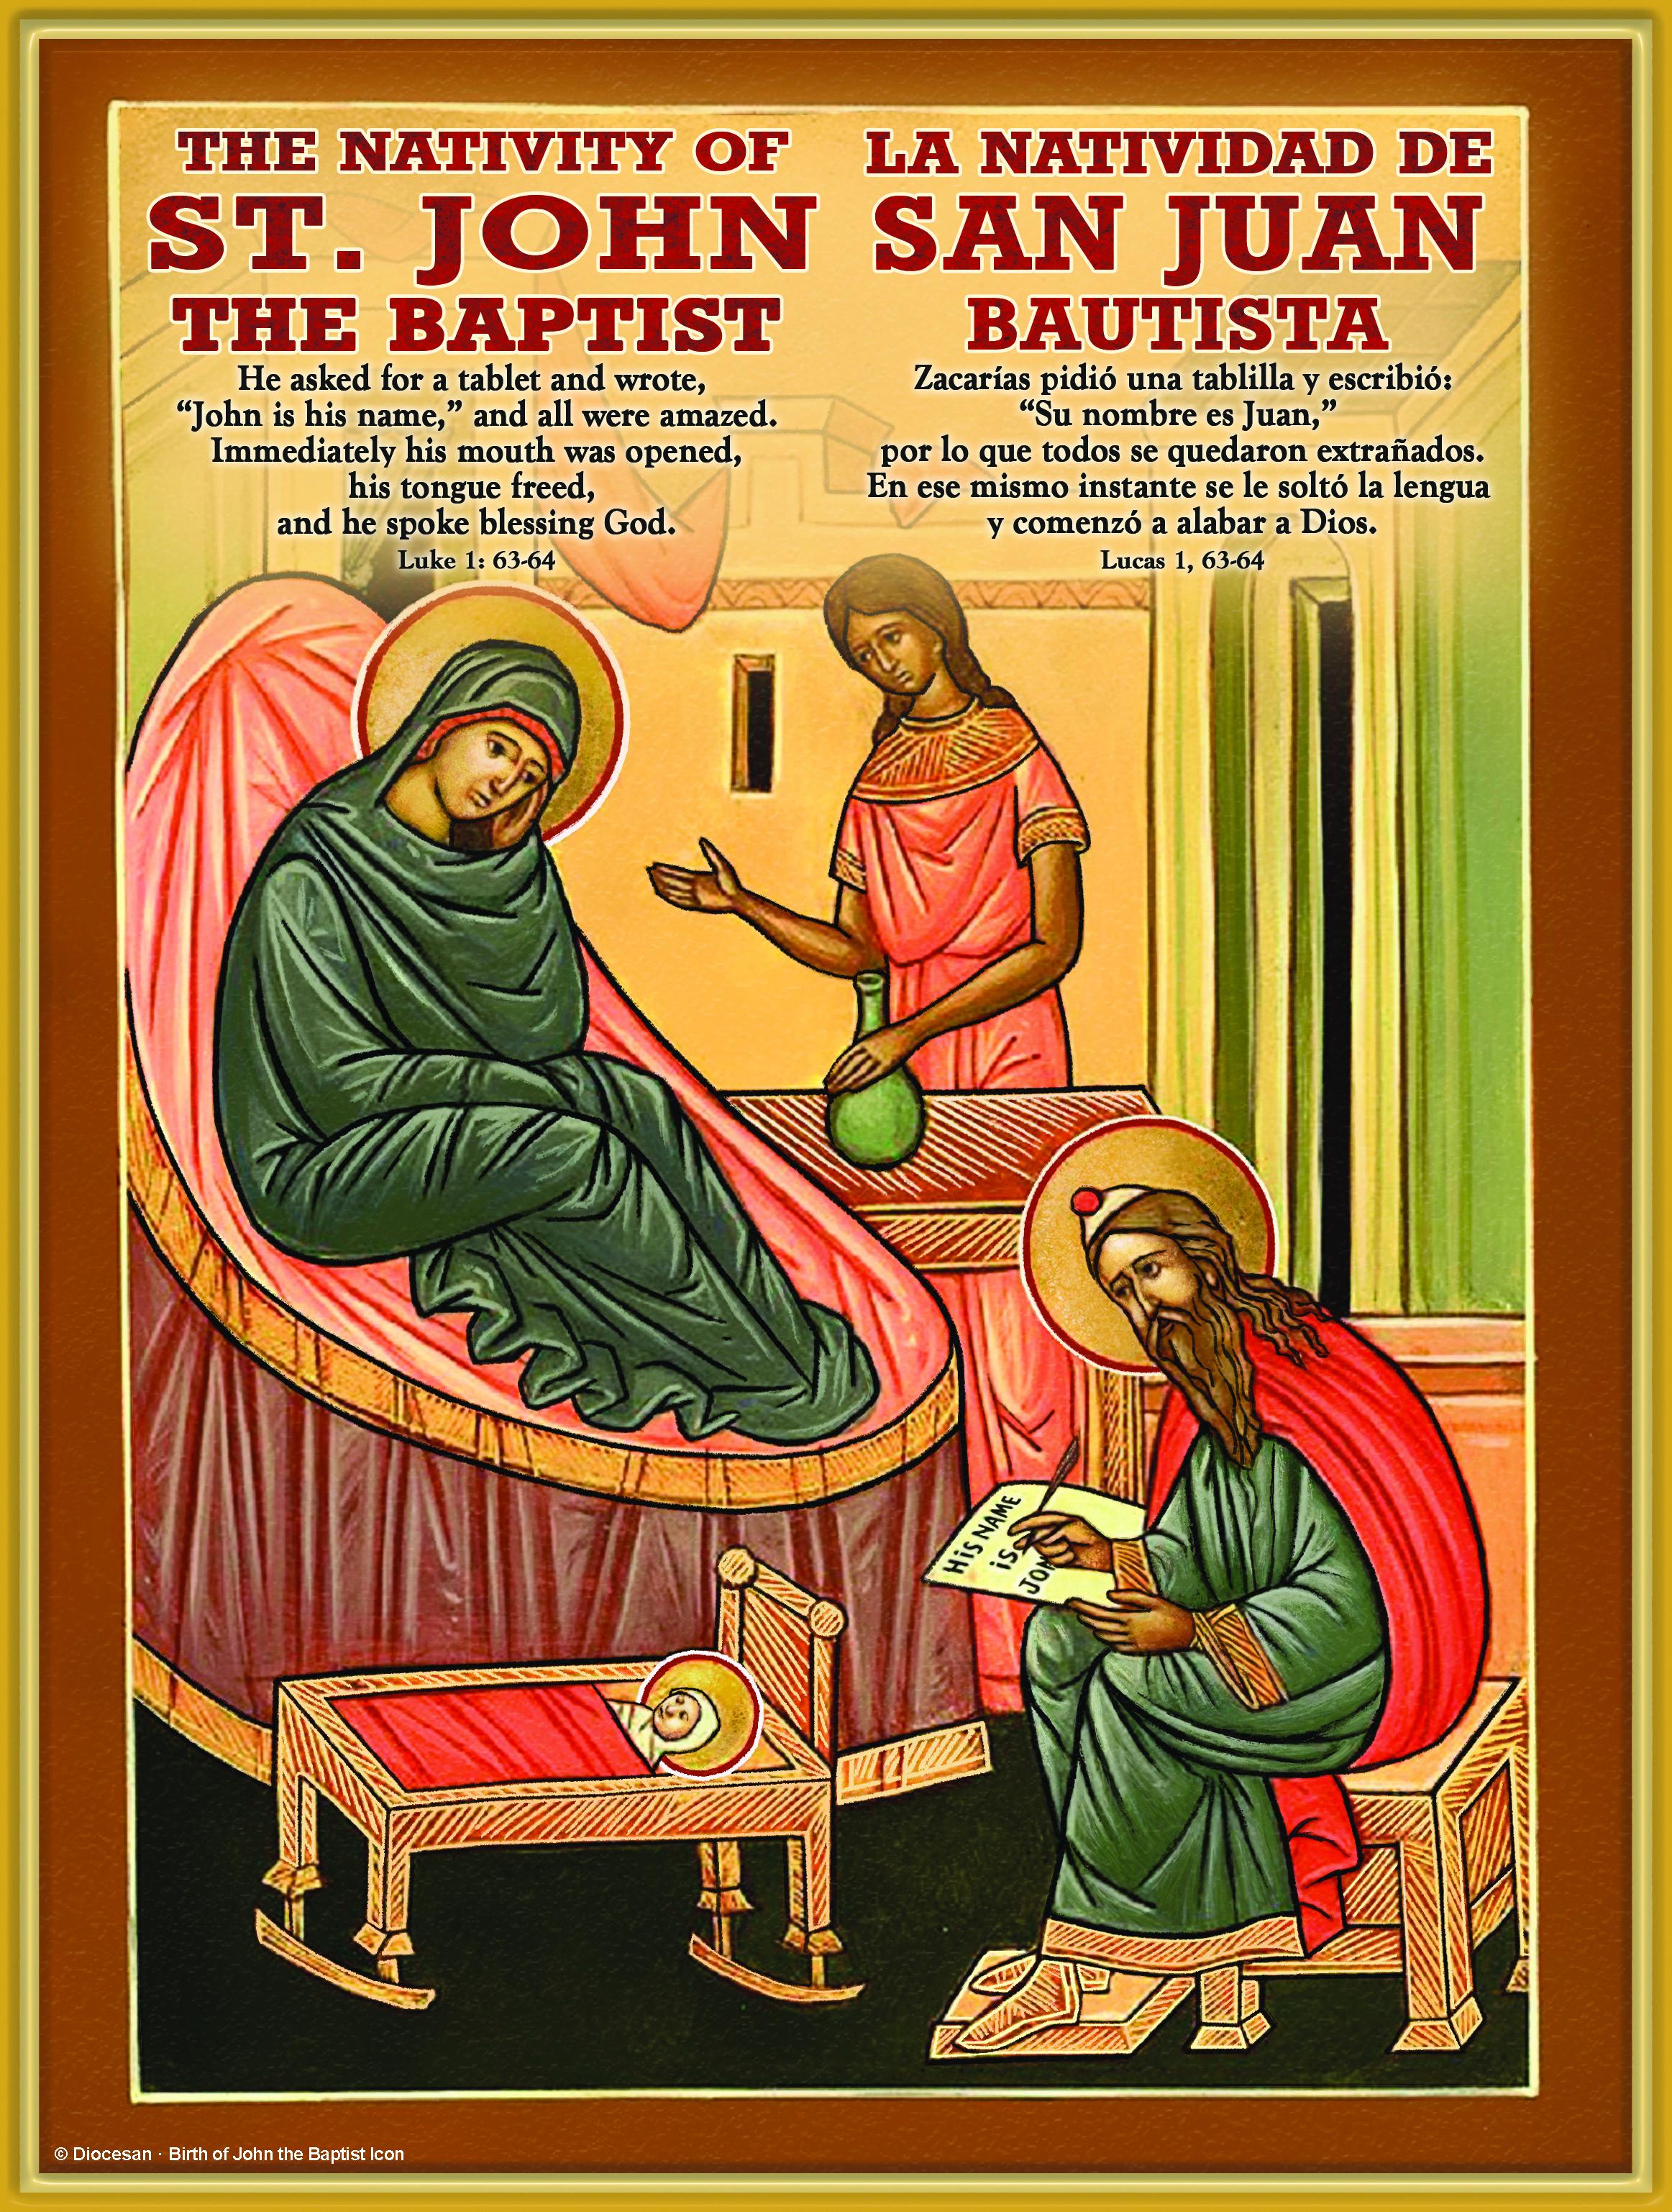 John the Baptist 2018 Iconic Bilingual